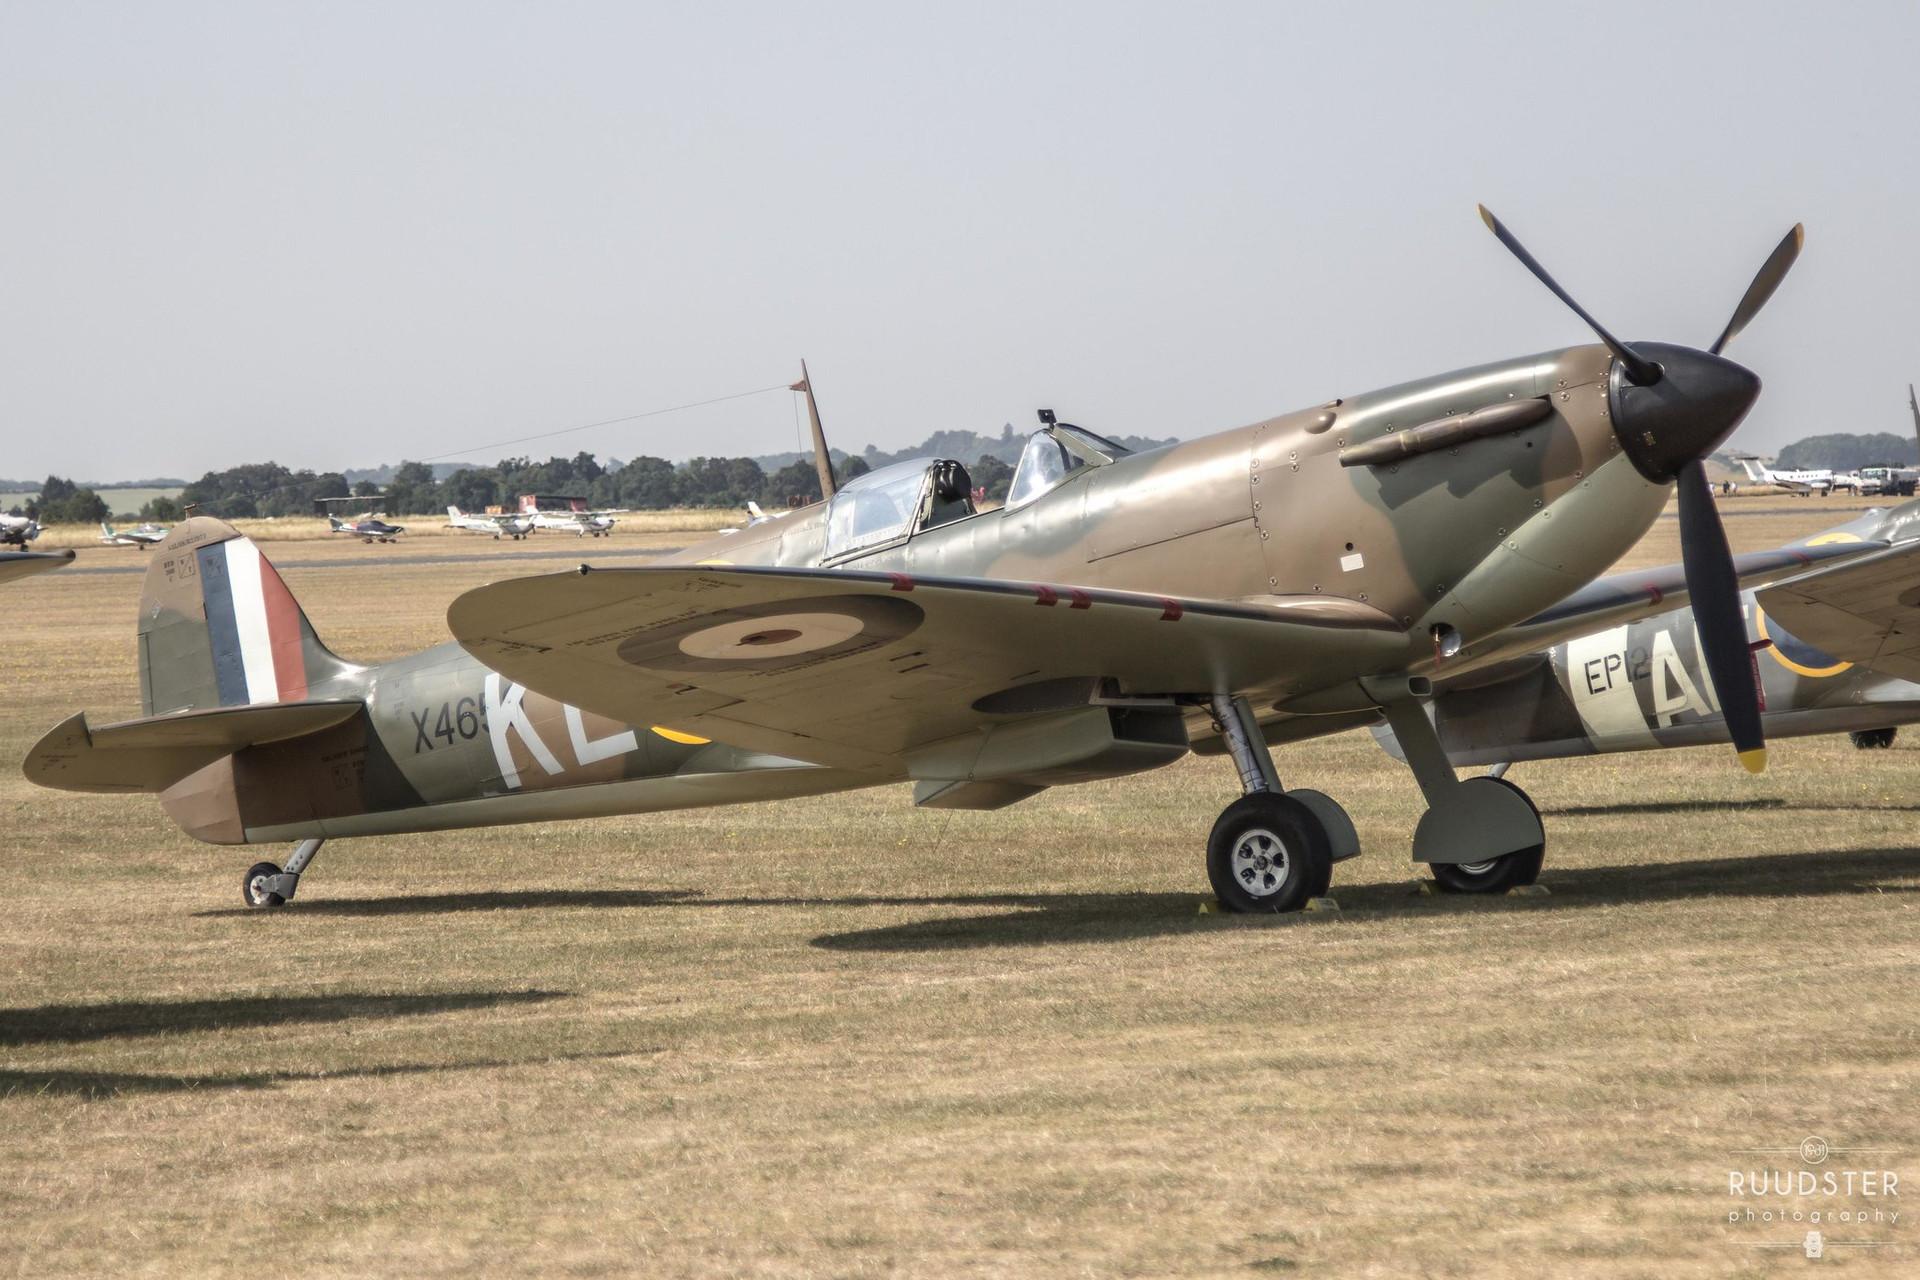 X4650 / G-CGUK   Build: 1940 - Supermarine Spitfire Mk.I